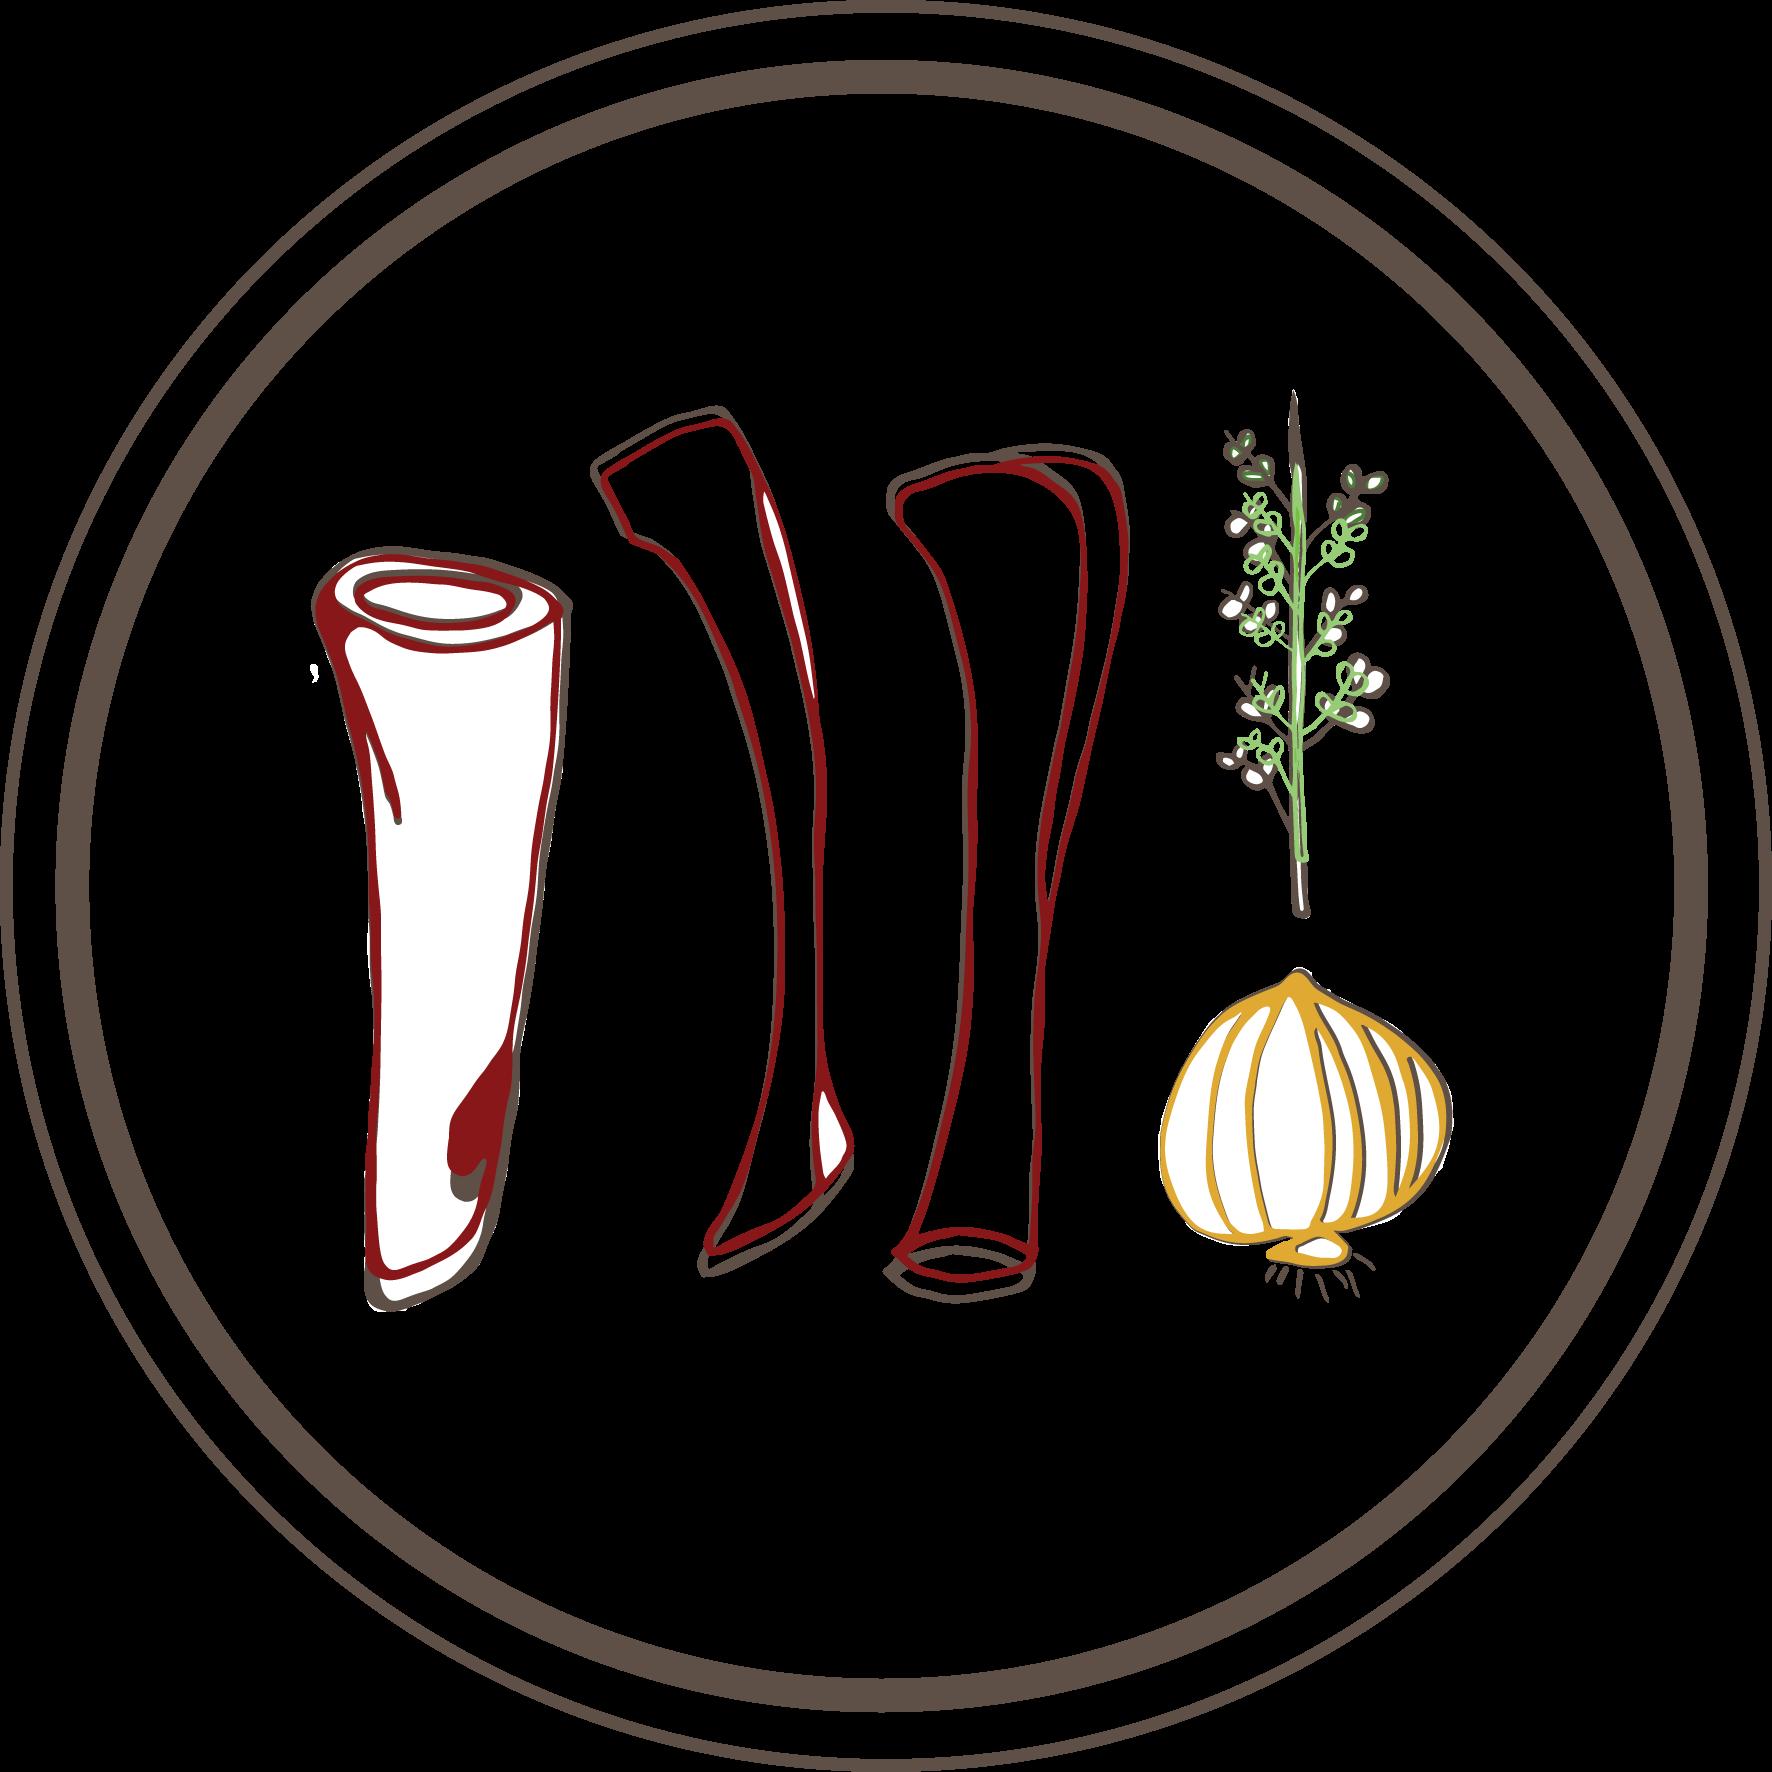 only bones by owen keturah for bonafide provisions